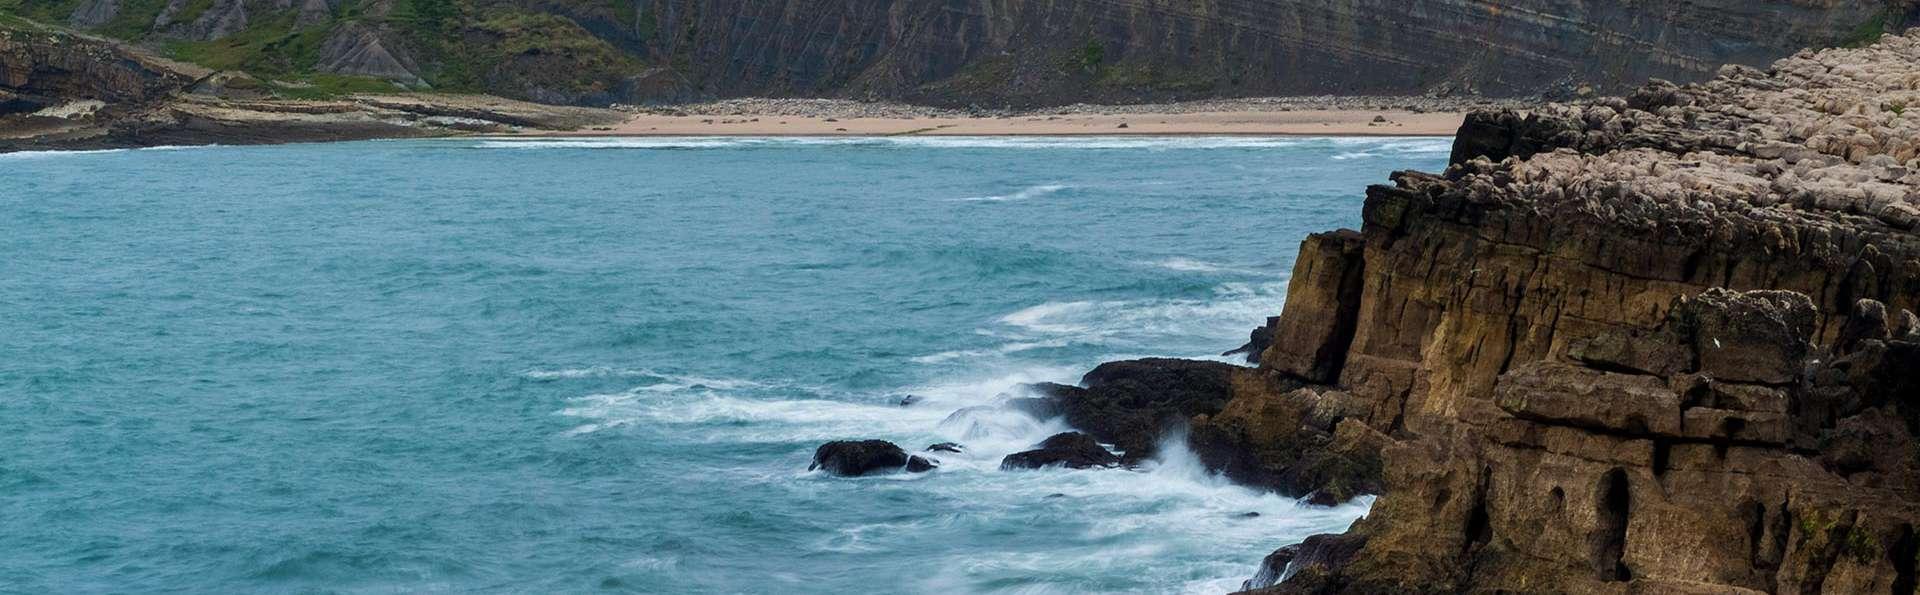 Bio Surf Camp - Edit_Suances4.jpg